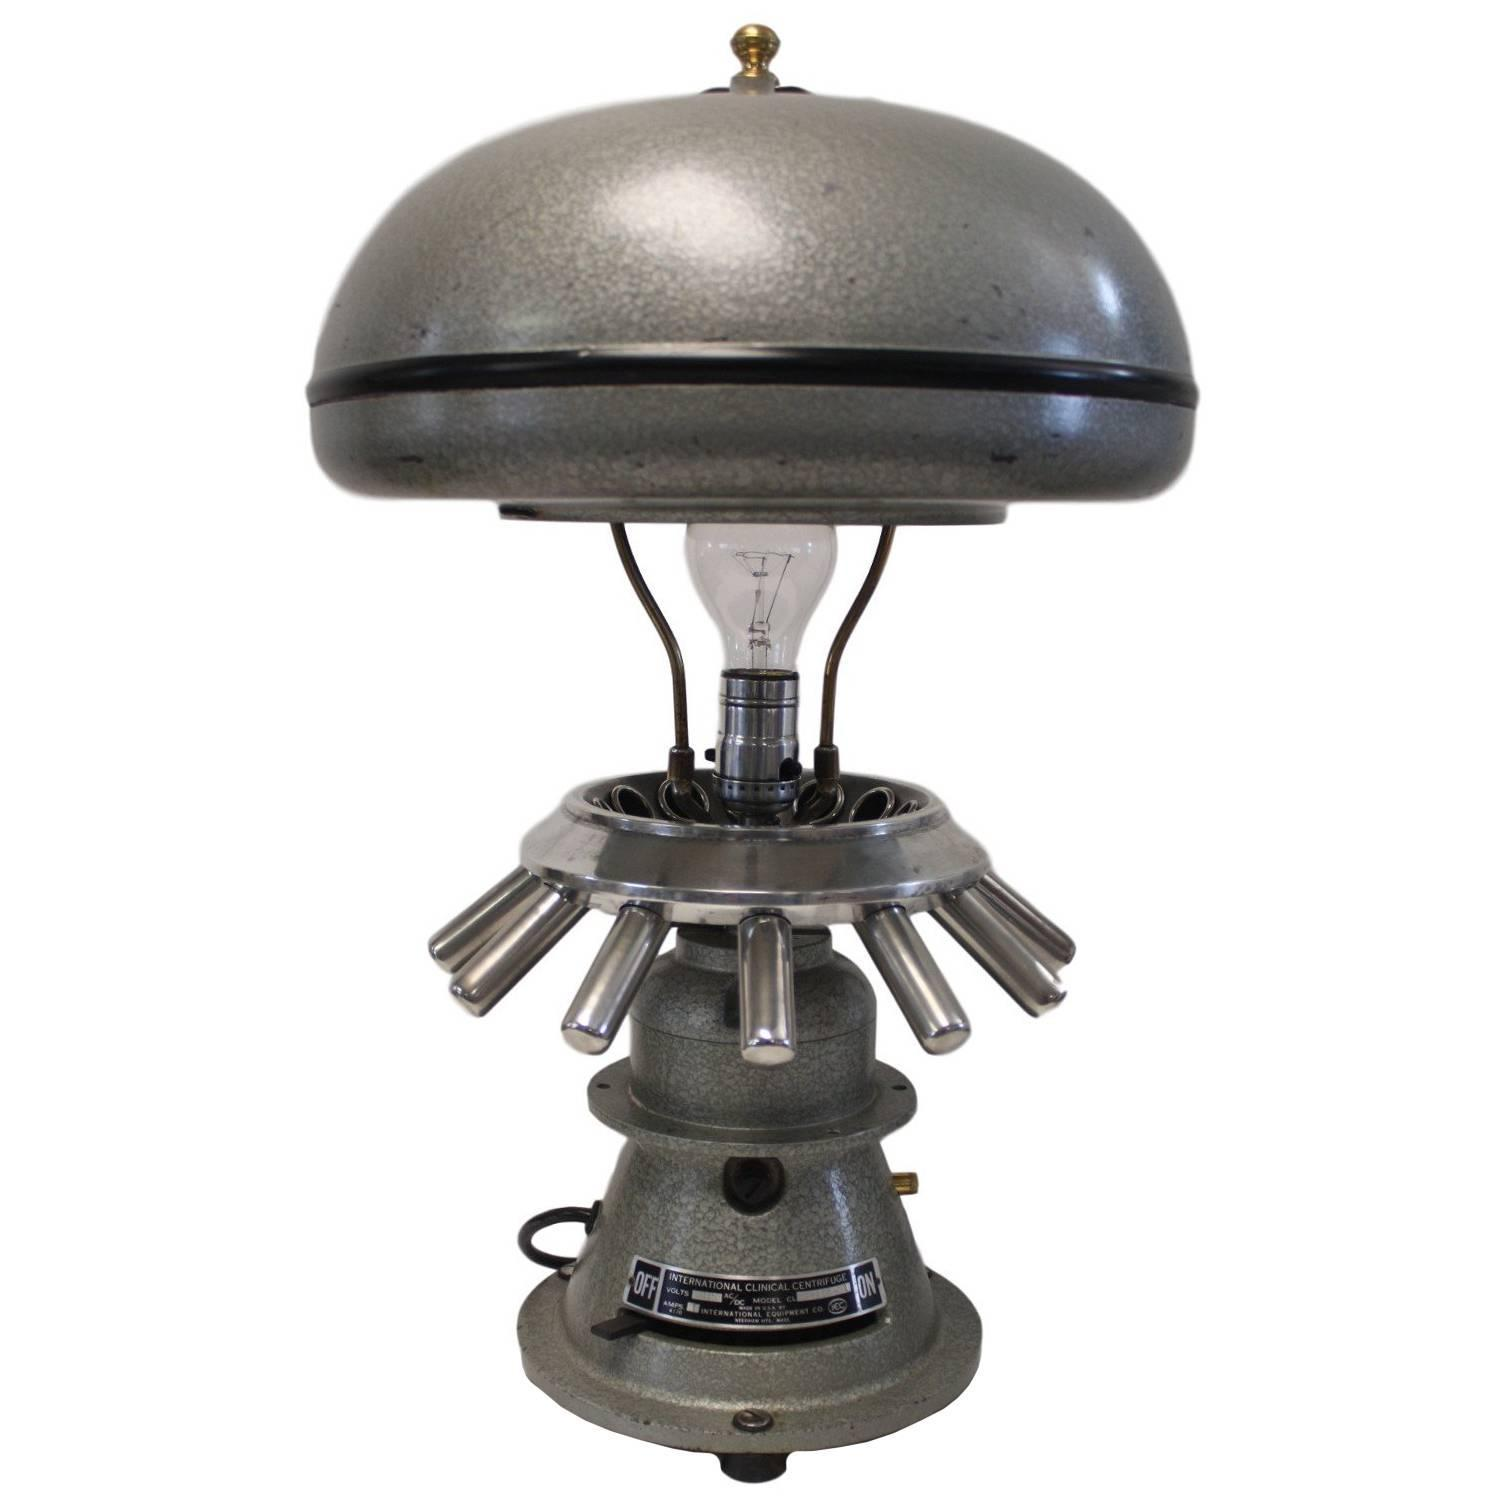 Vintage 40s cast iron metal deco industrial gooseneck desk lamp light - Re Purposed Vintage 1950s Industrial Scientific Centrifuge Table Lamp Light